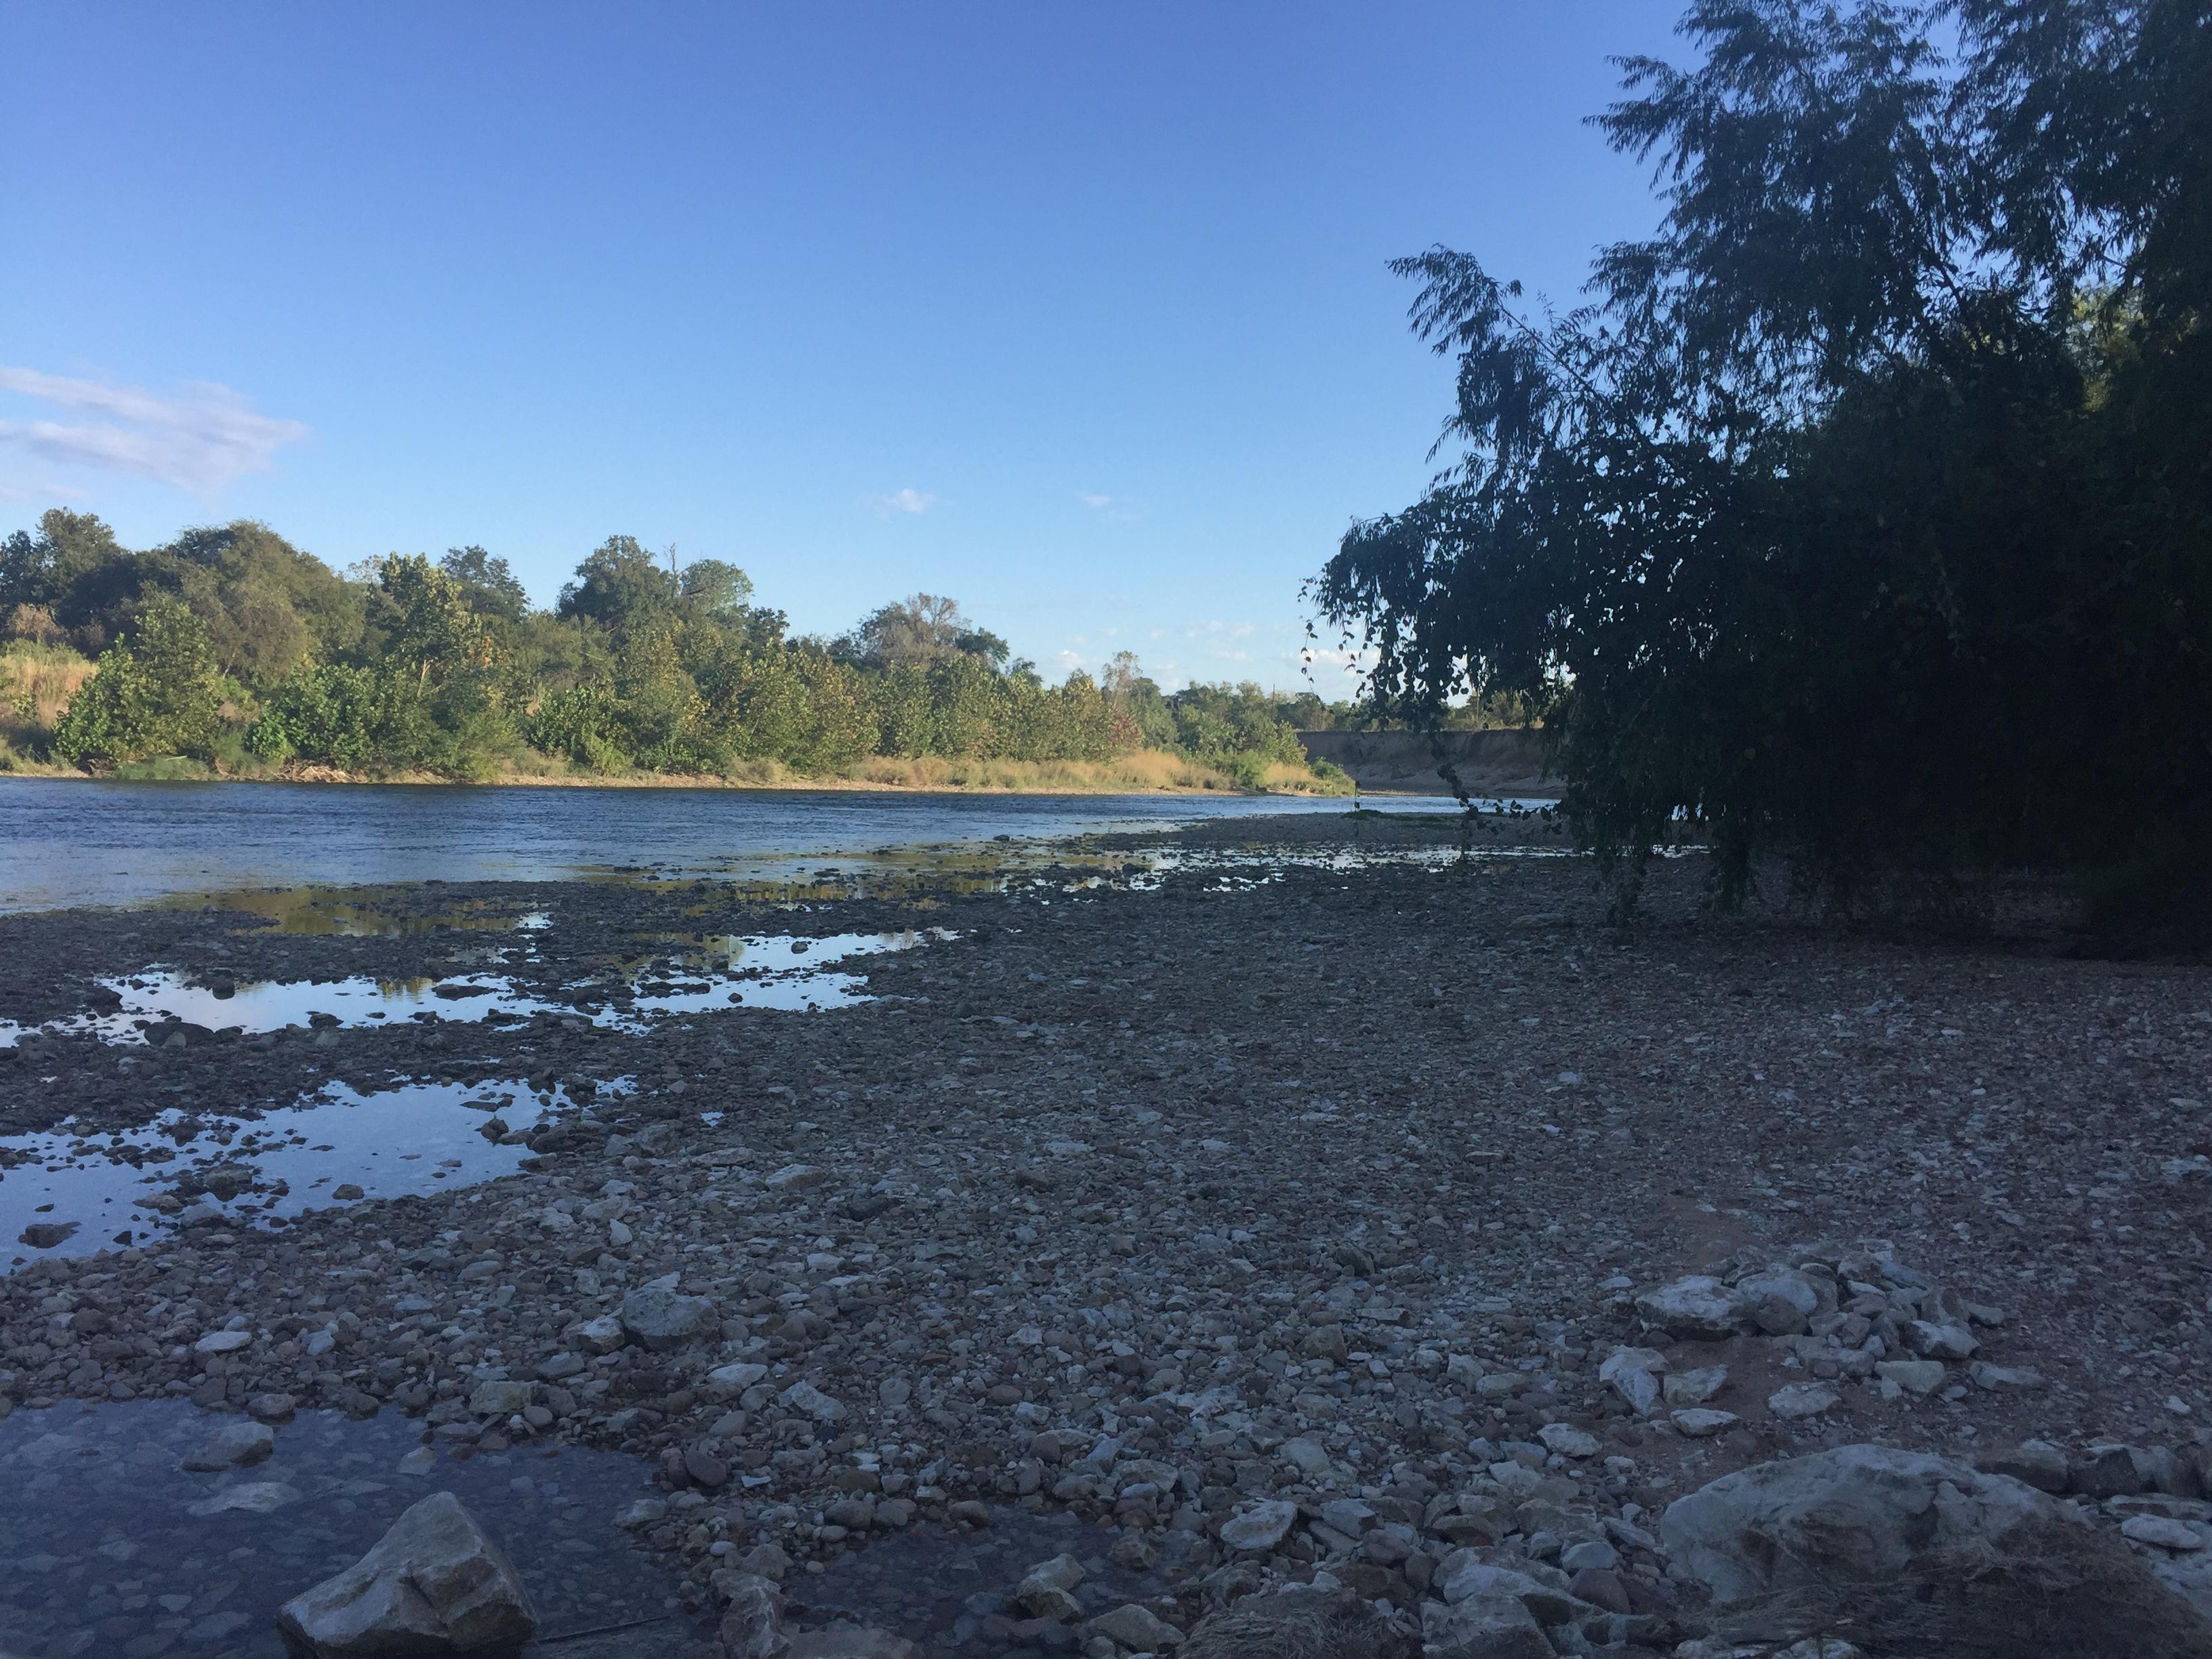 The Colorado River Access Point